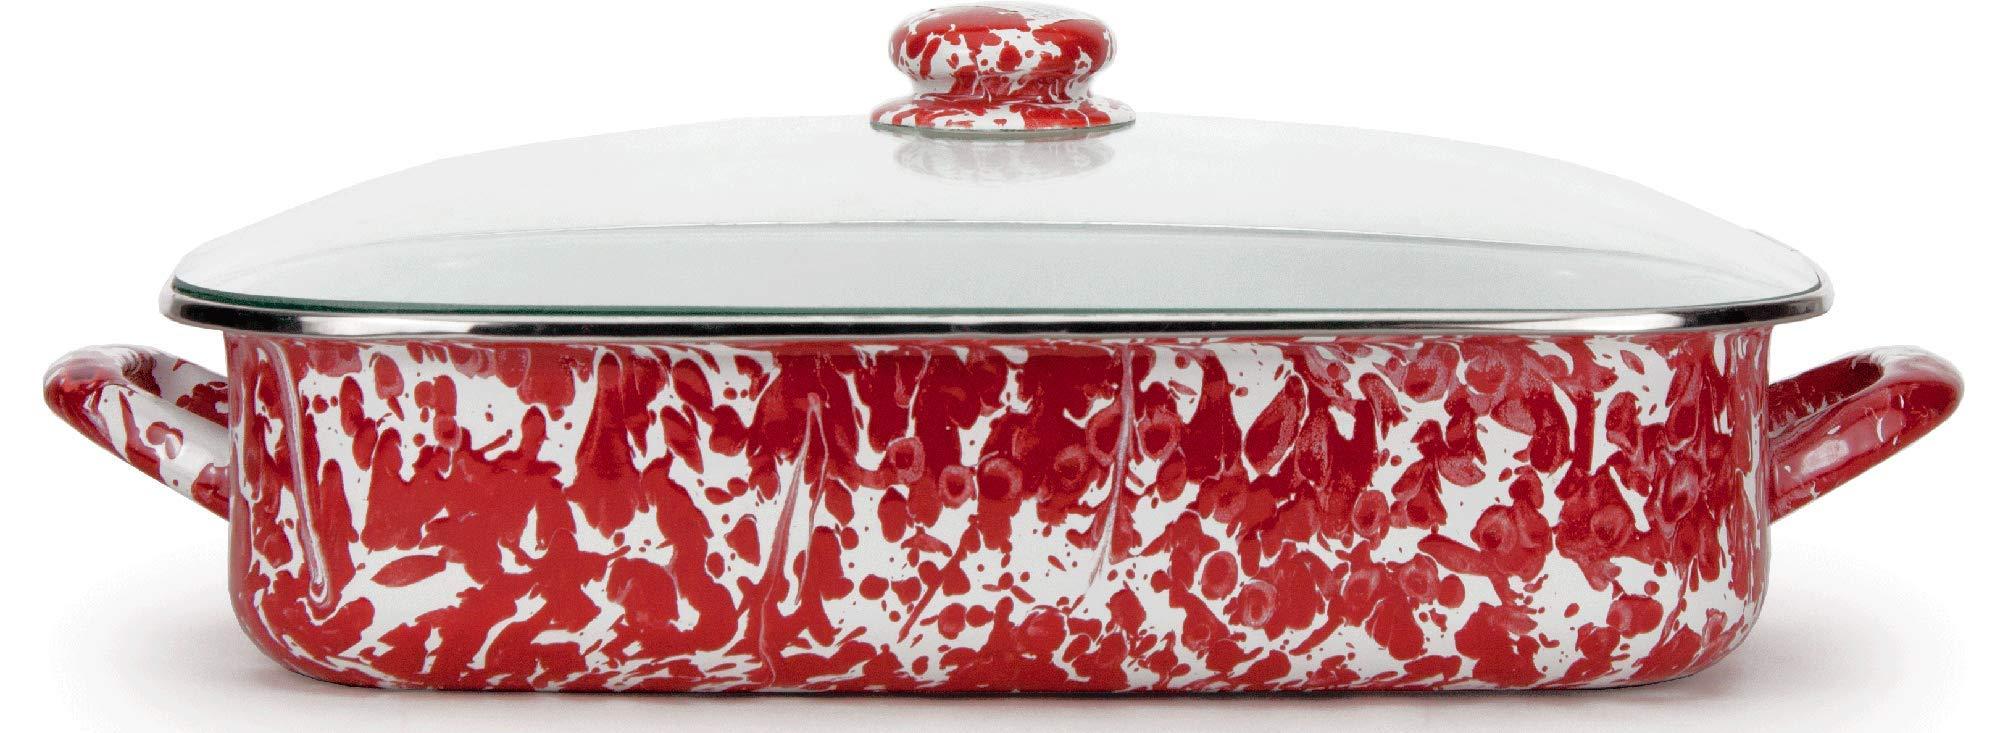 Golden Rabbit Enamelware - Red Swirl Pattern -16 x 12.5 x 4 inch Lasagna Pan Set by Golden Rabbit